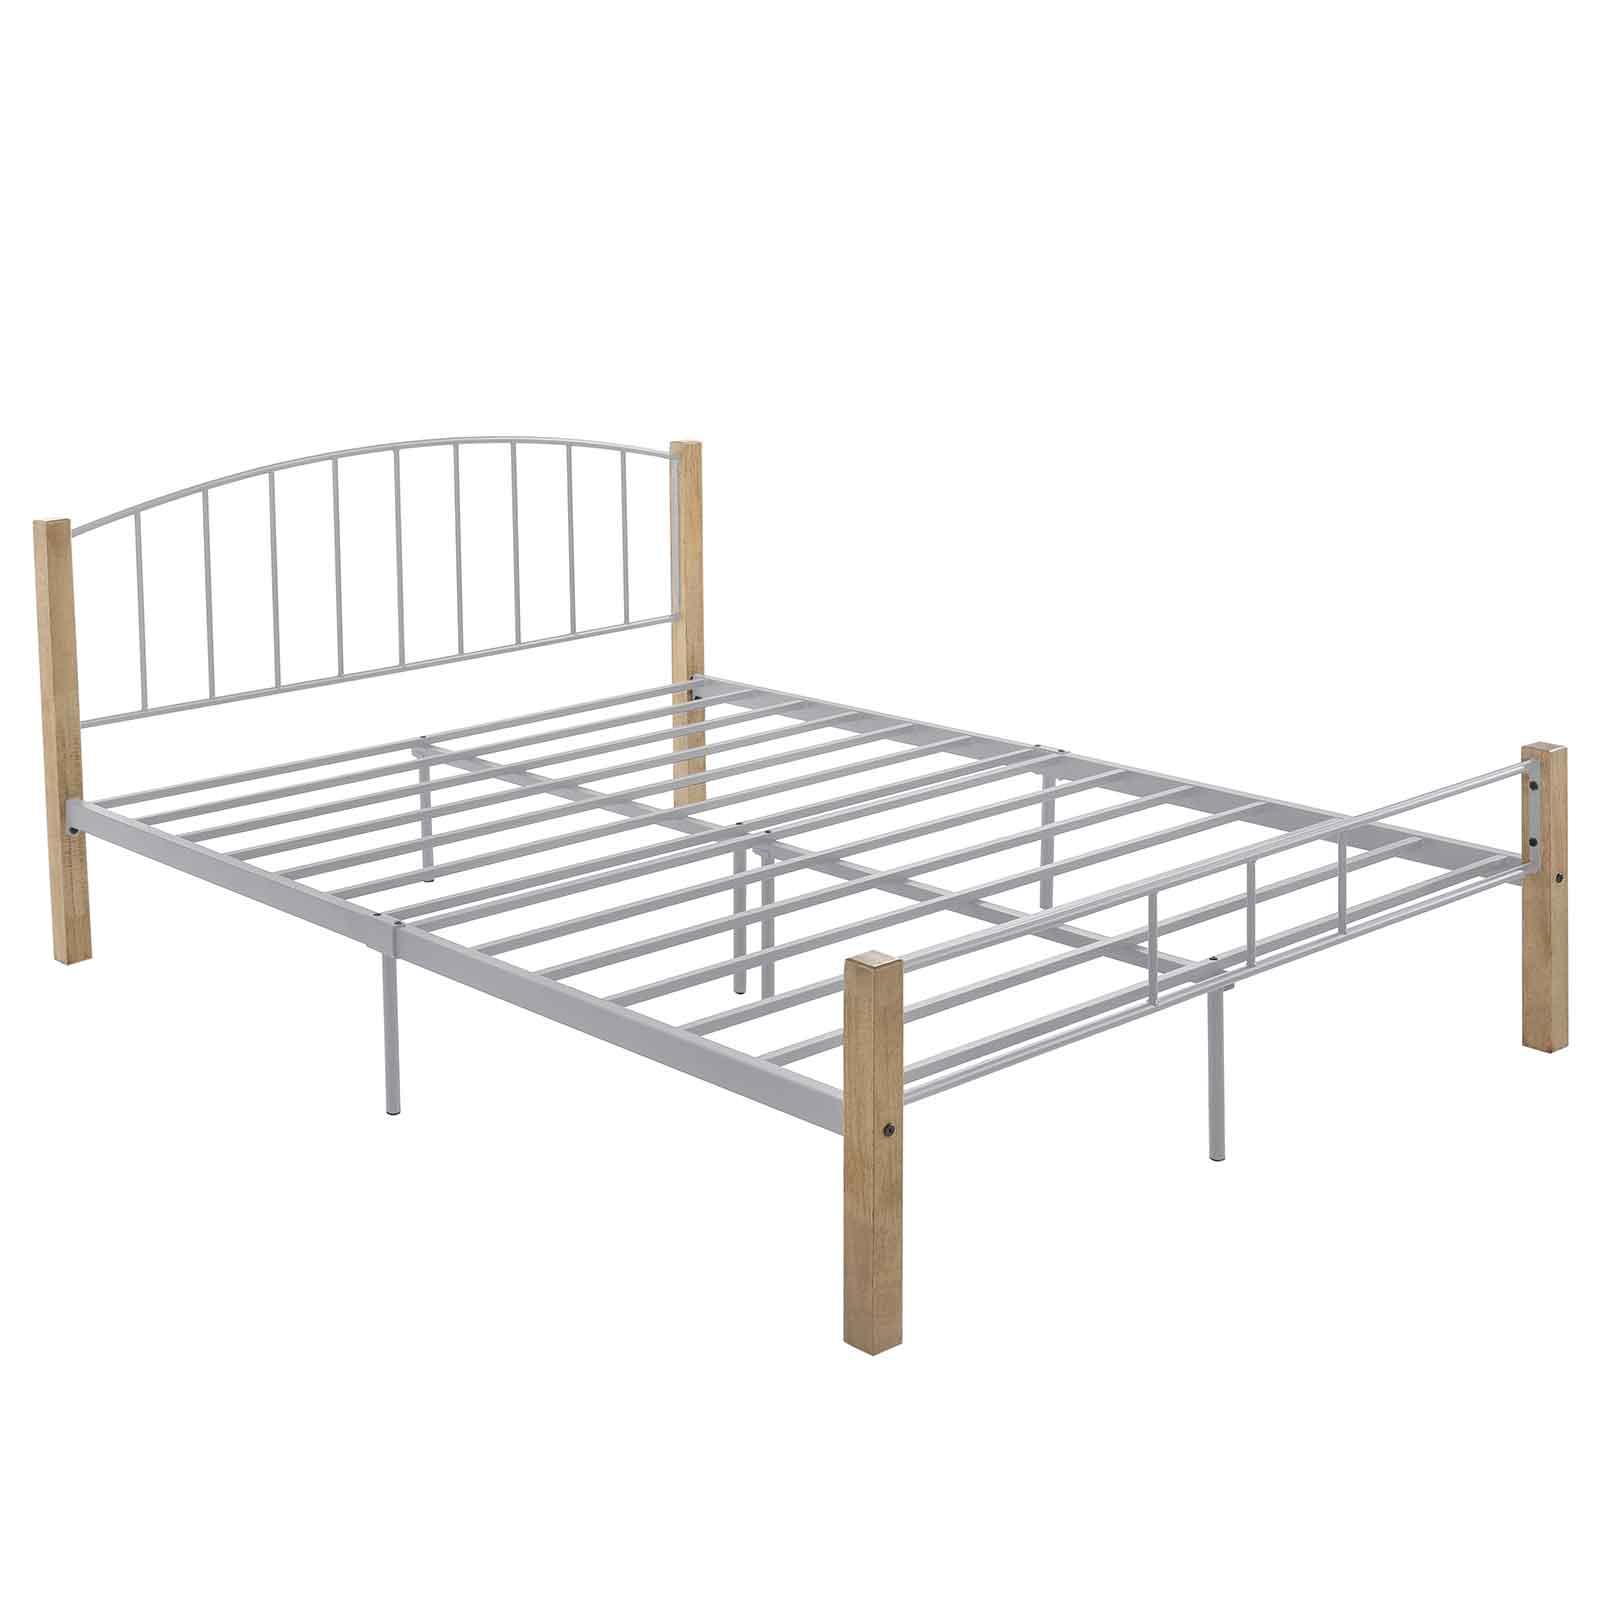 King Bed Australia